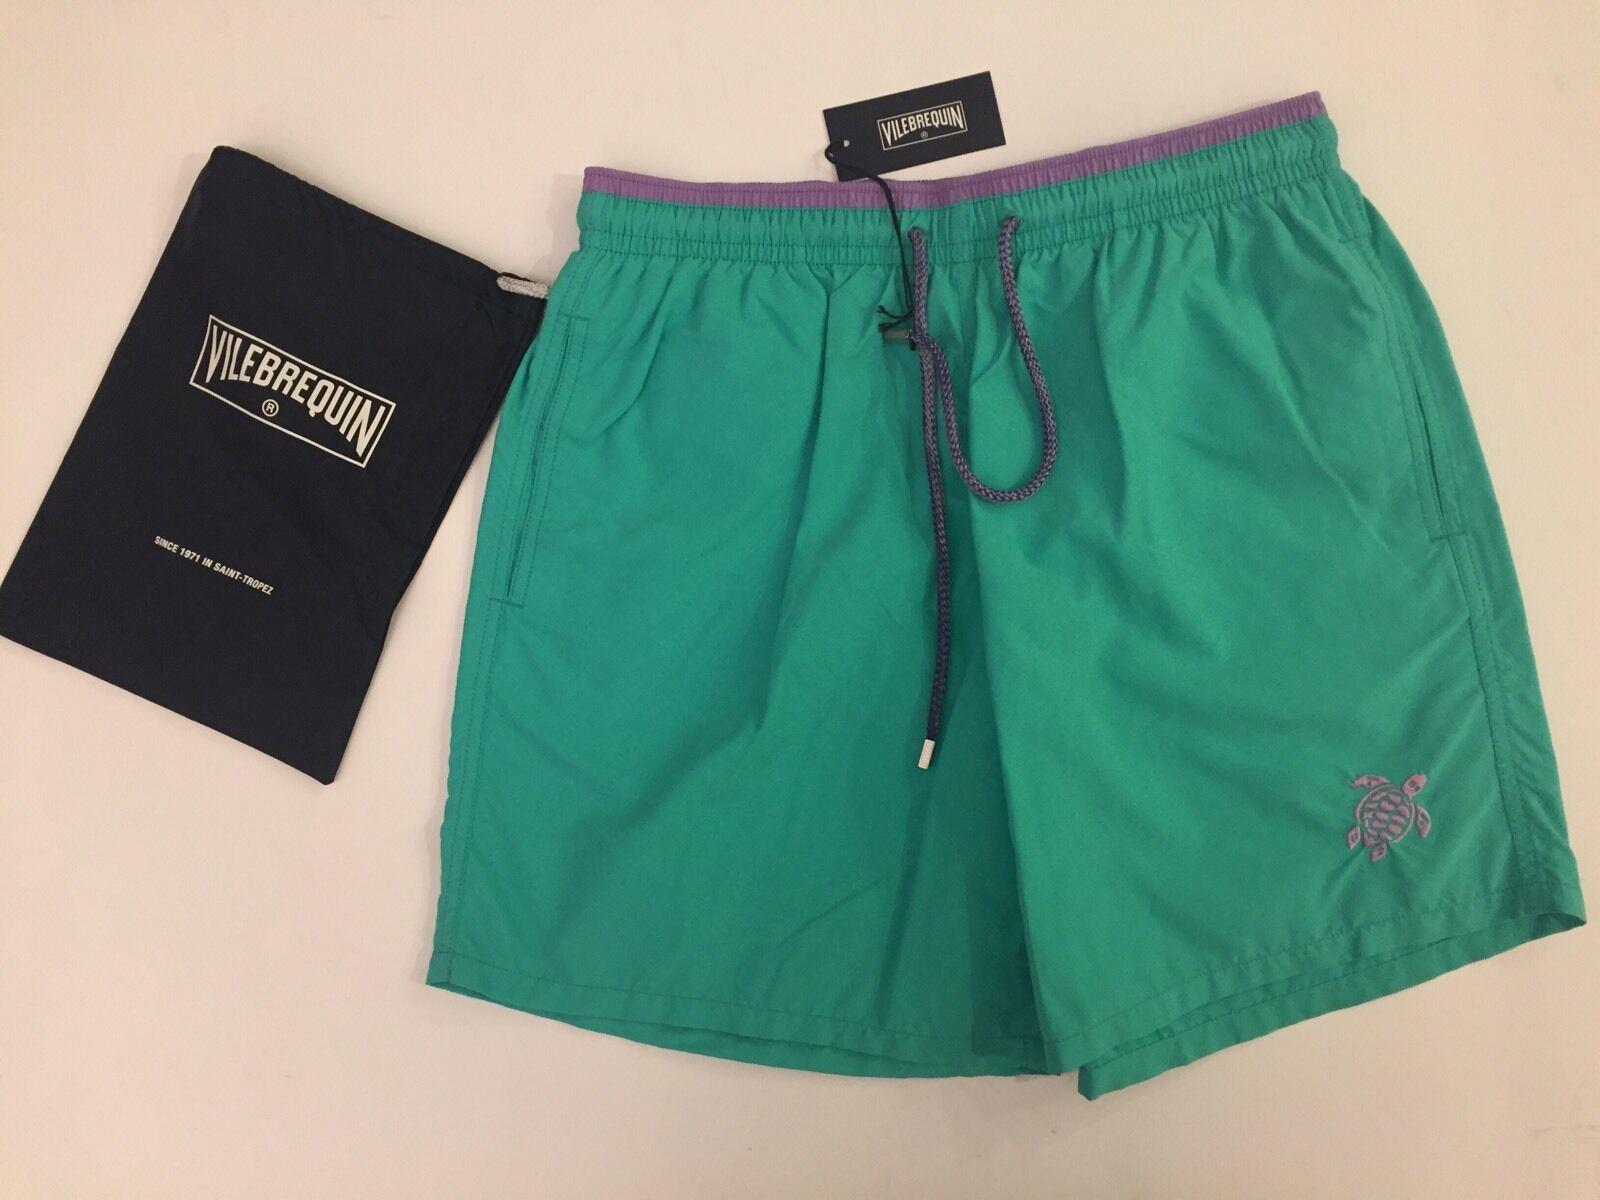 New w Tags & Bag Authentic Vilebrequin Moka Swim Trunks Green - Men 3XL